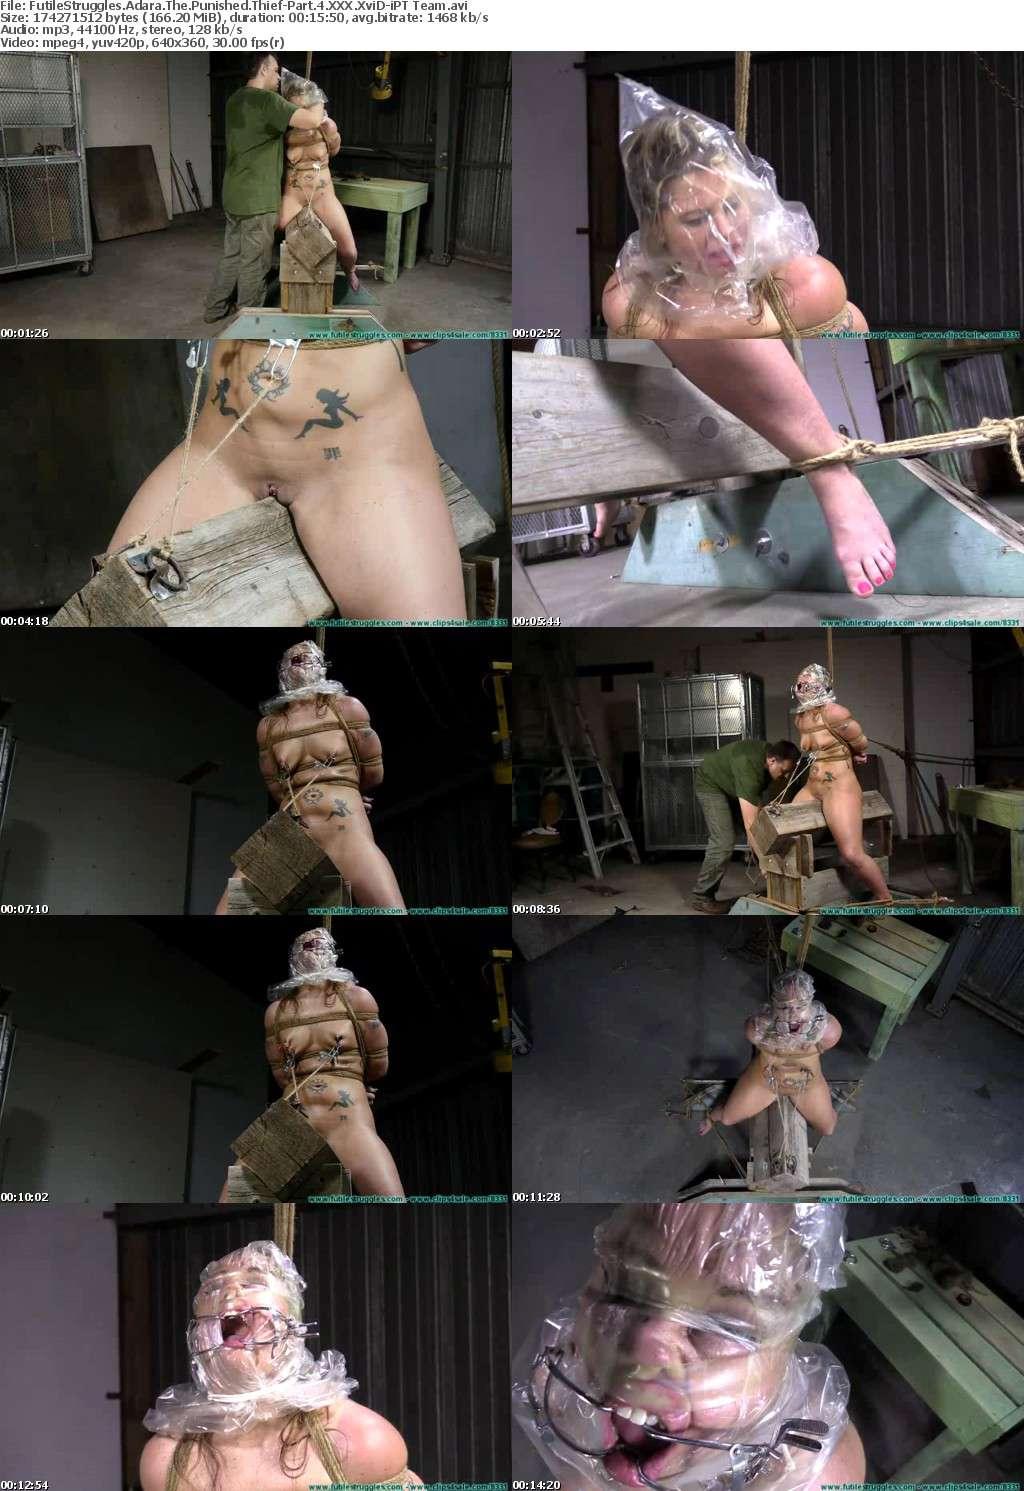 FutileStruggles Adara The Punished Thief-Part 4 XXX